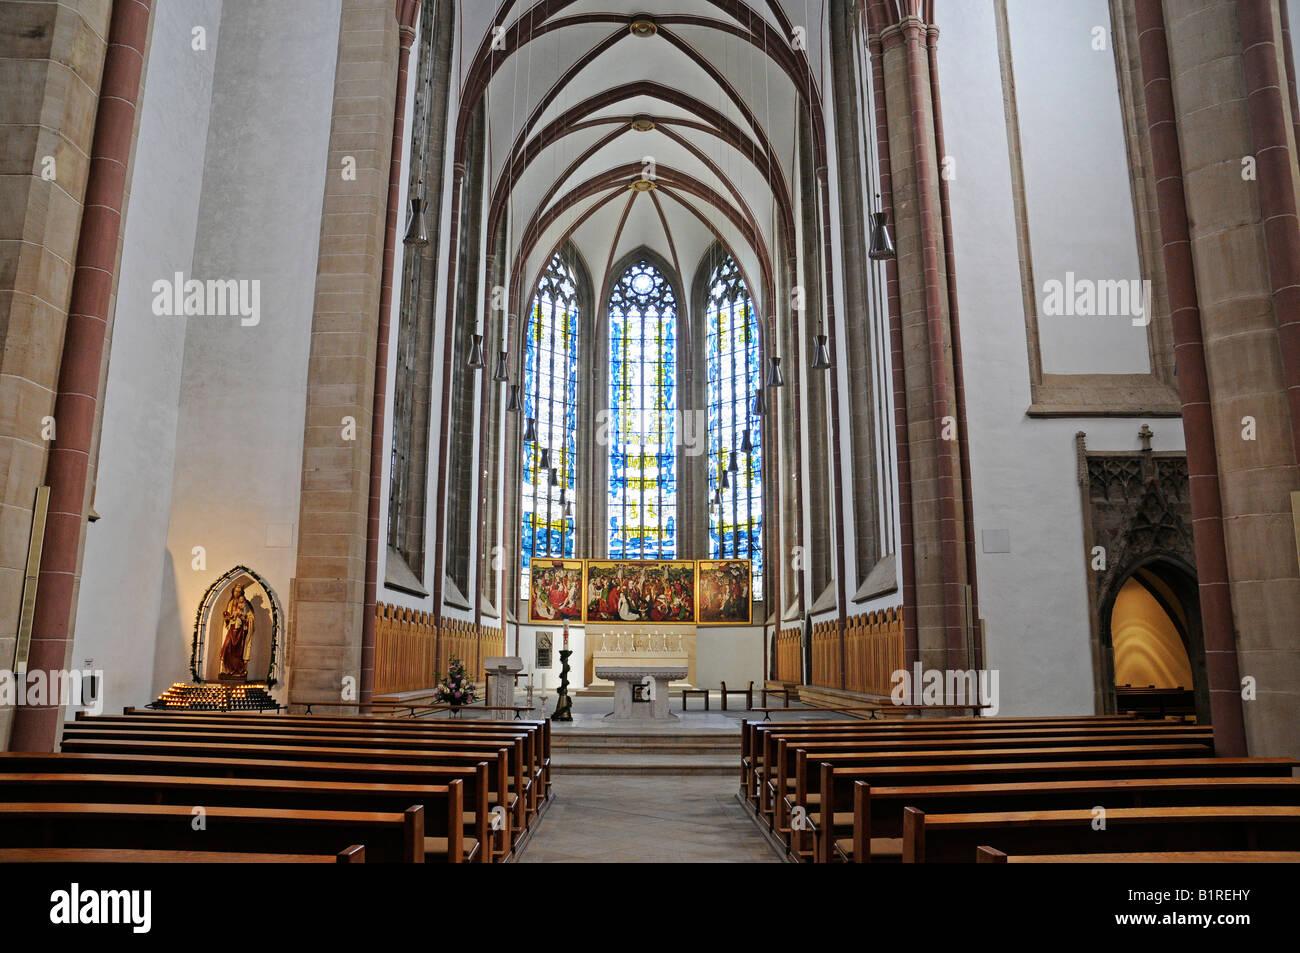 Winged alter of the Propsteikirche Church, Dortmund, North Rhine-Westphalia, Germany, Europe Stock Photo